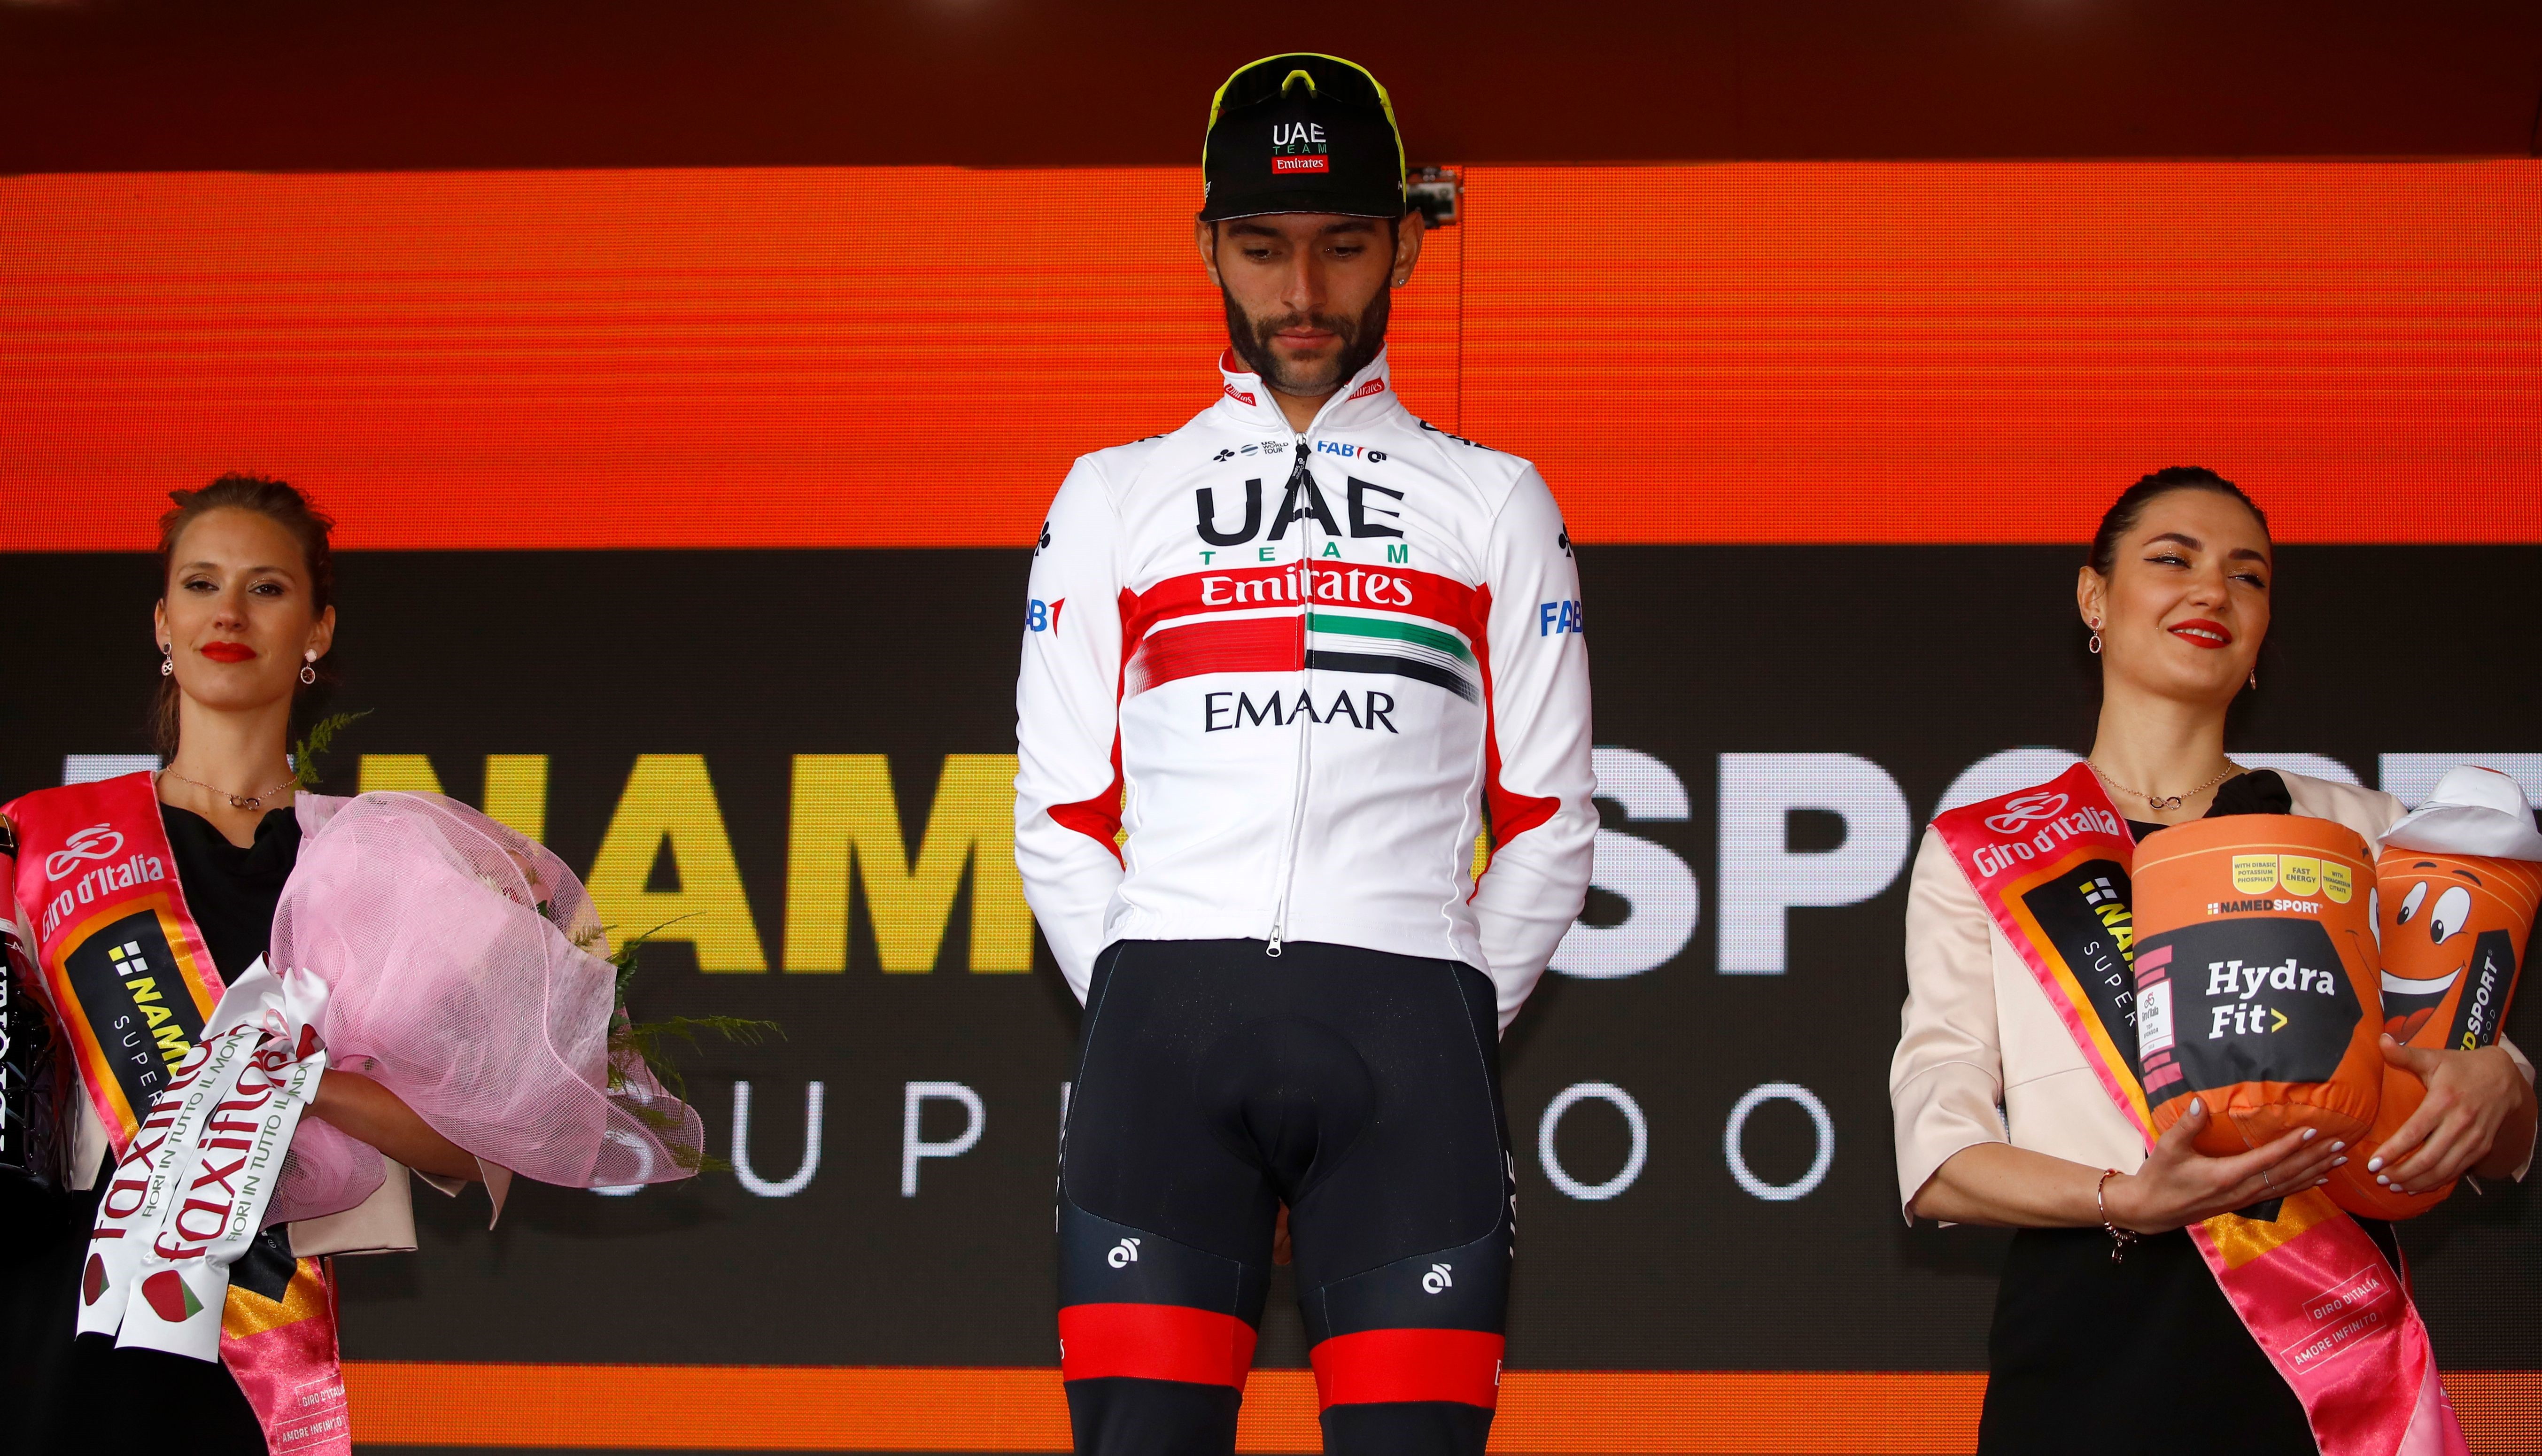 Fernando Gaviria (Team UAE Emirates) sur le podium dela 3e étape duTour d'Italie 2019